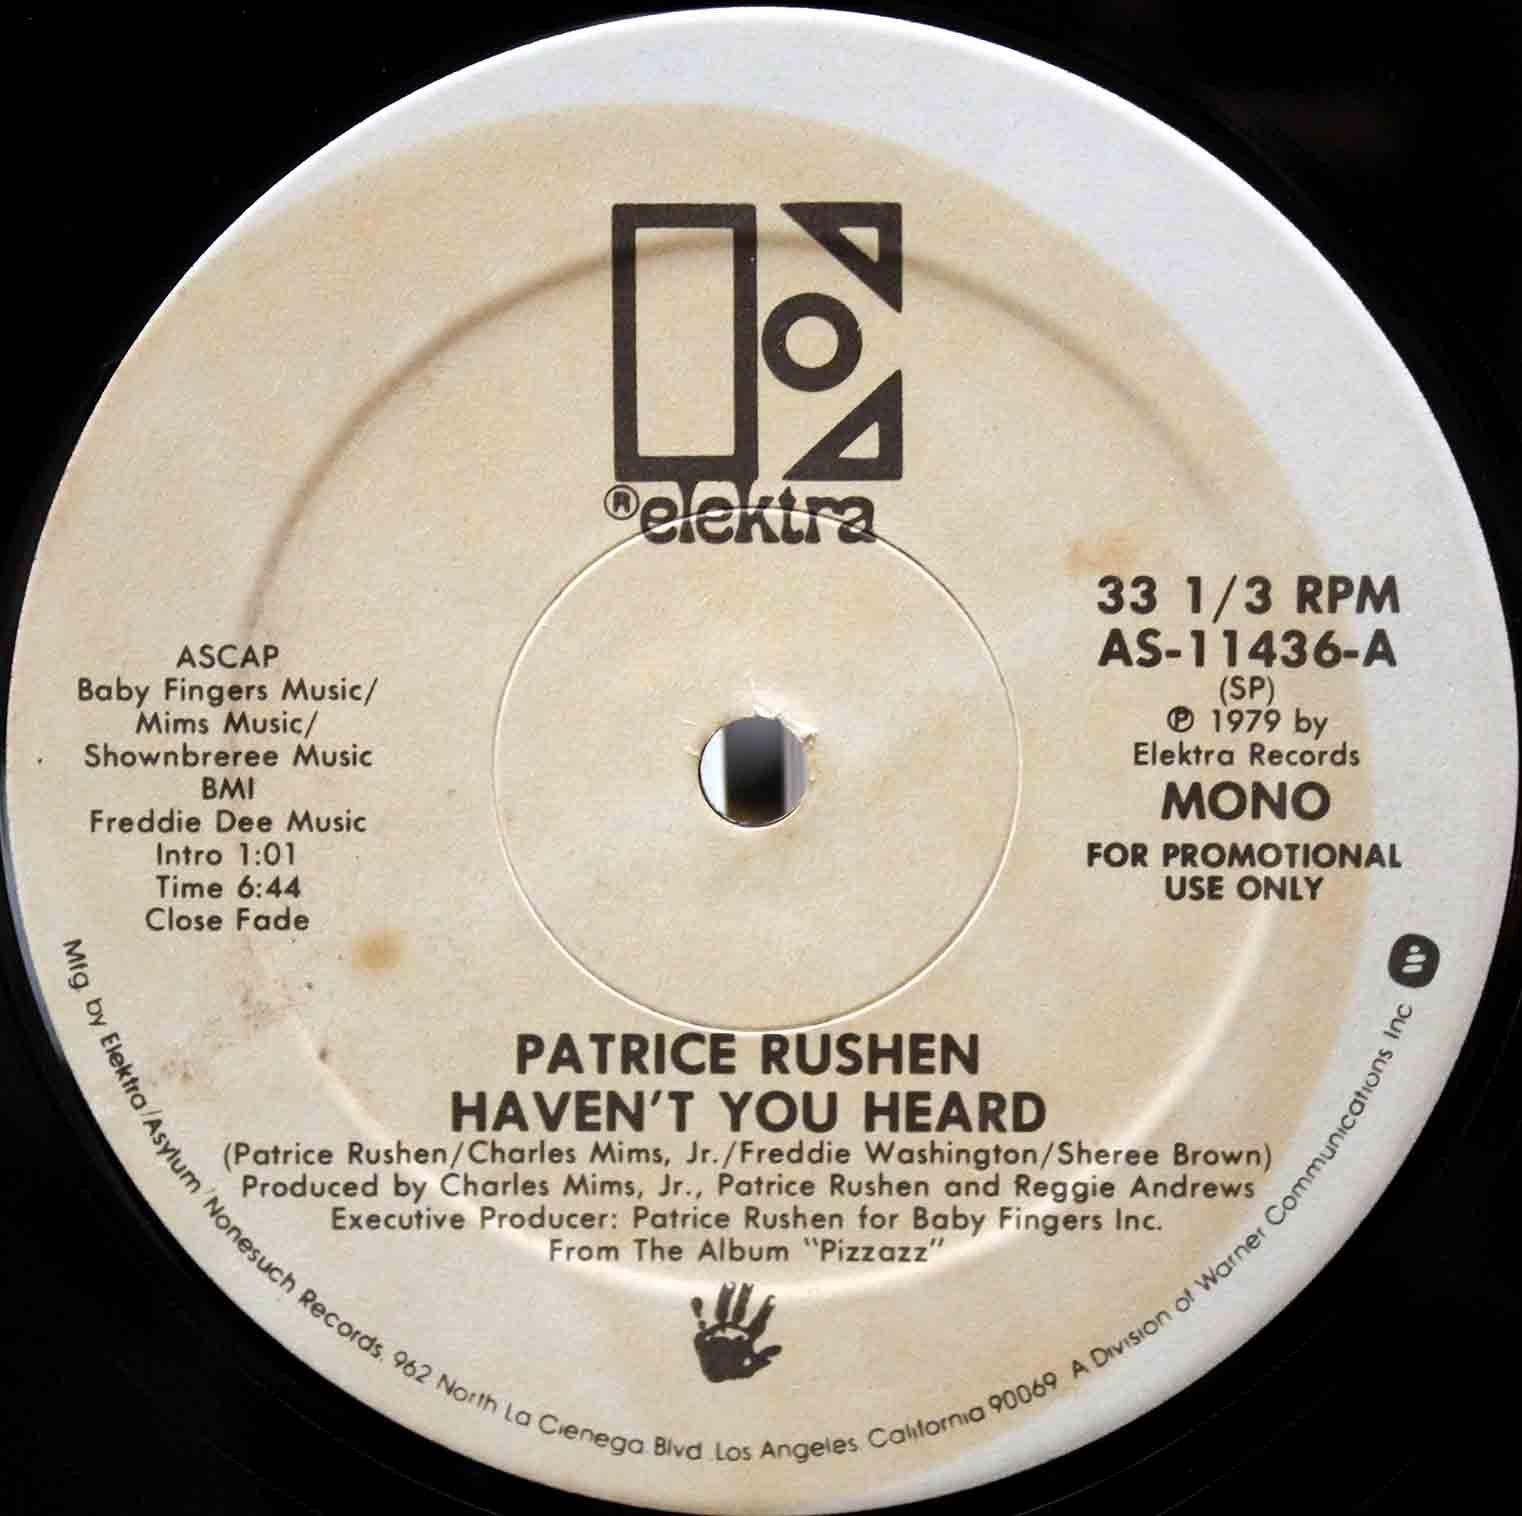 Patrice Rushen – Havent You Heard 04